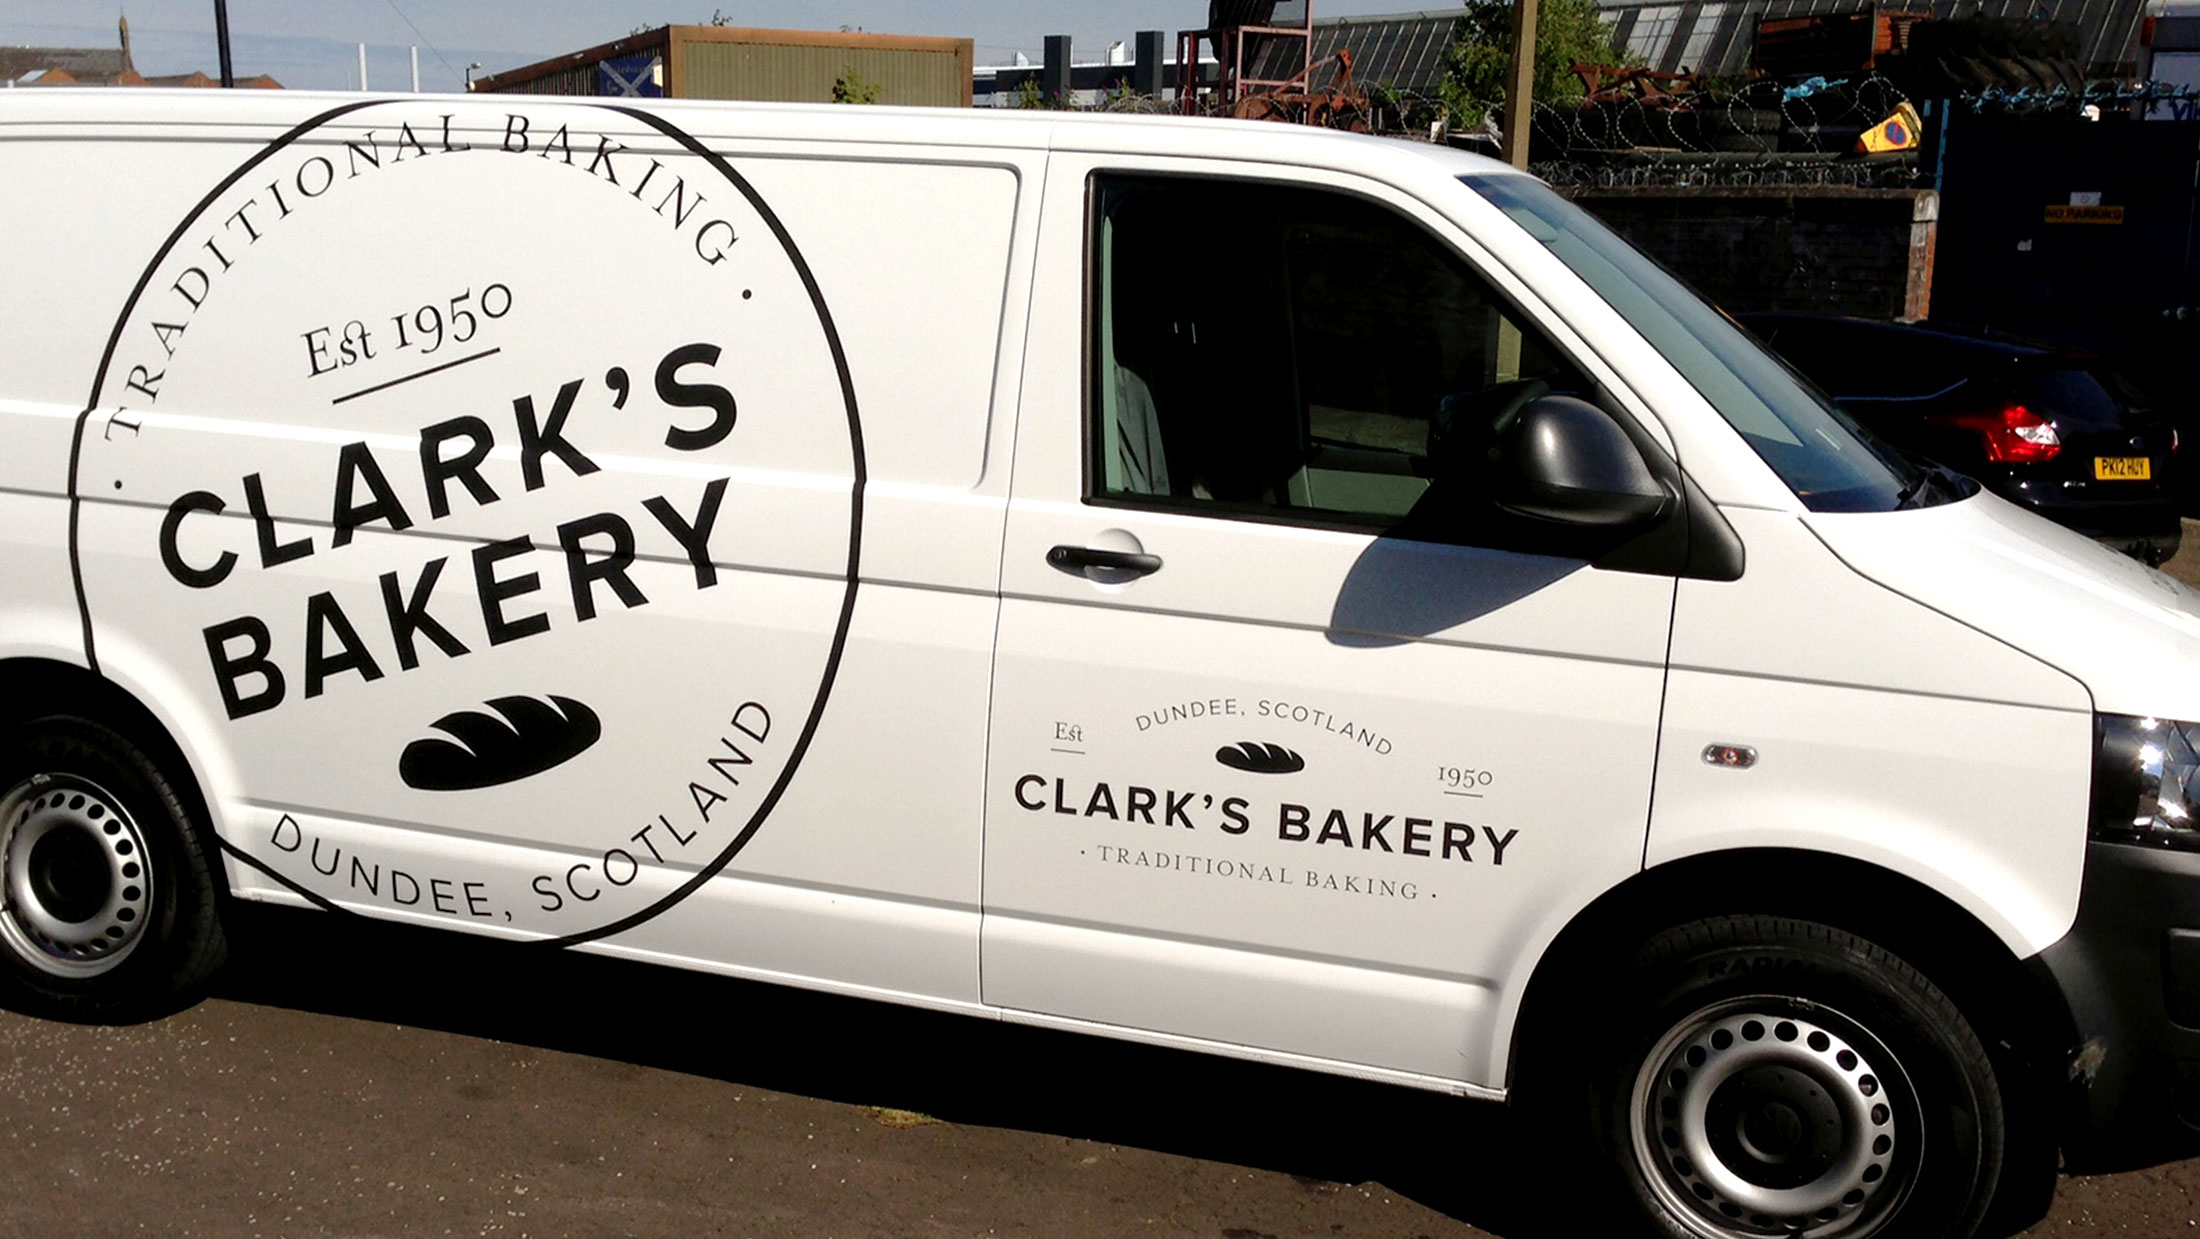 Clark's Bakery logo shown on the side of a white van